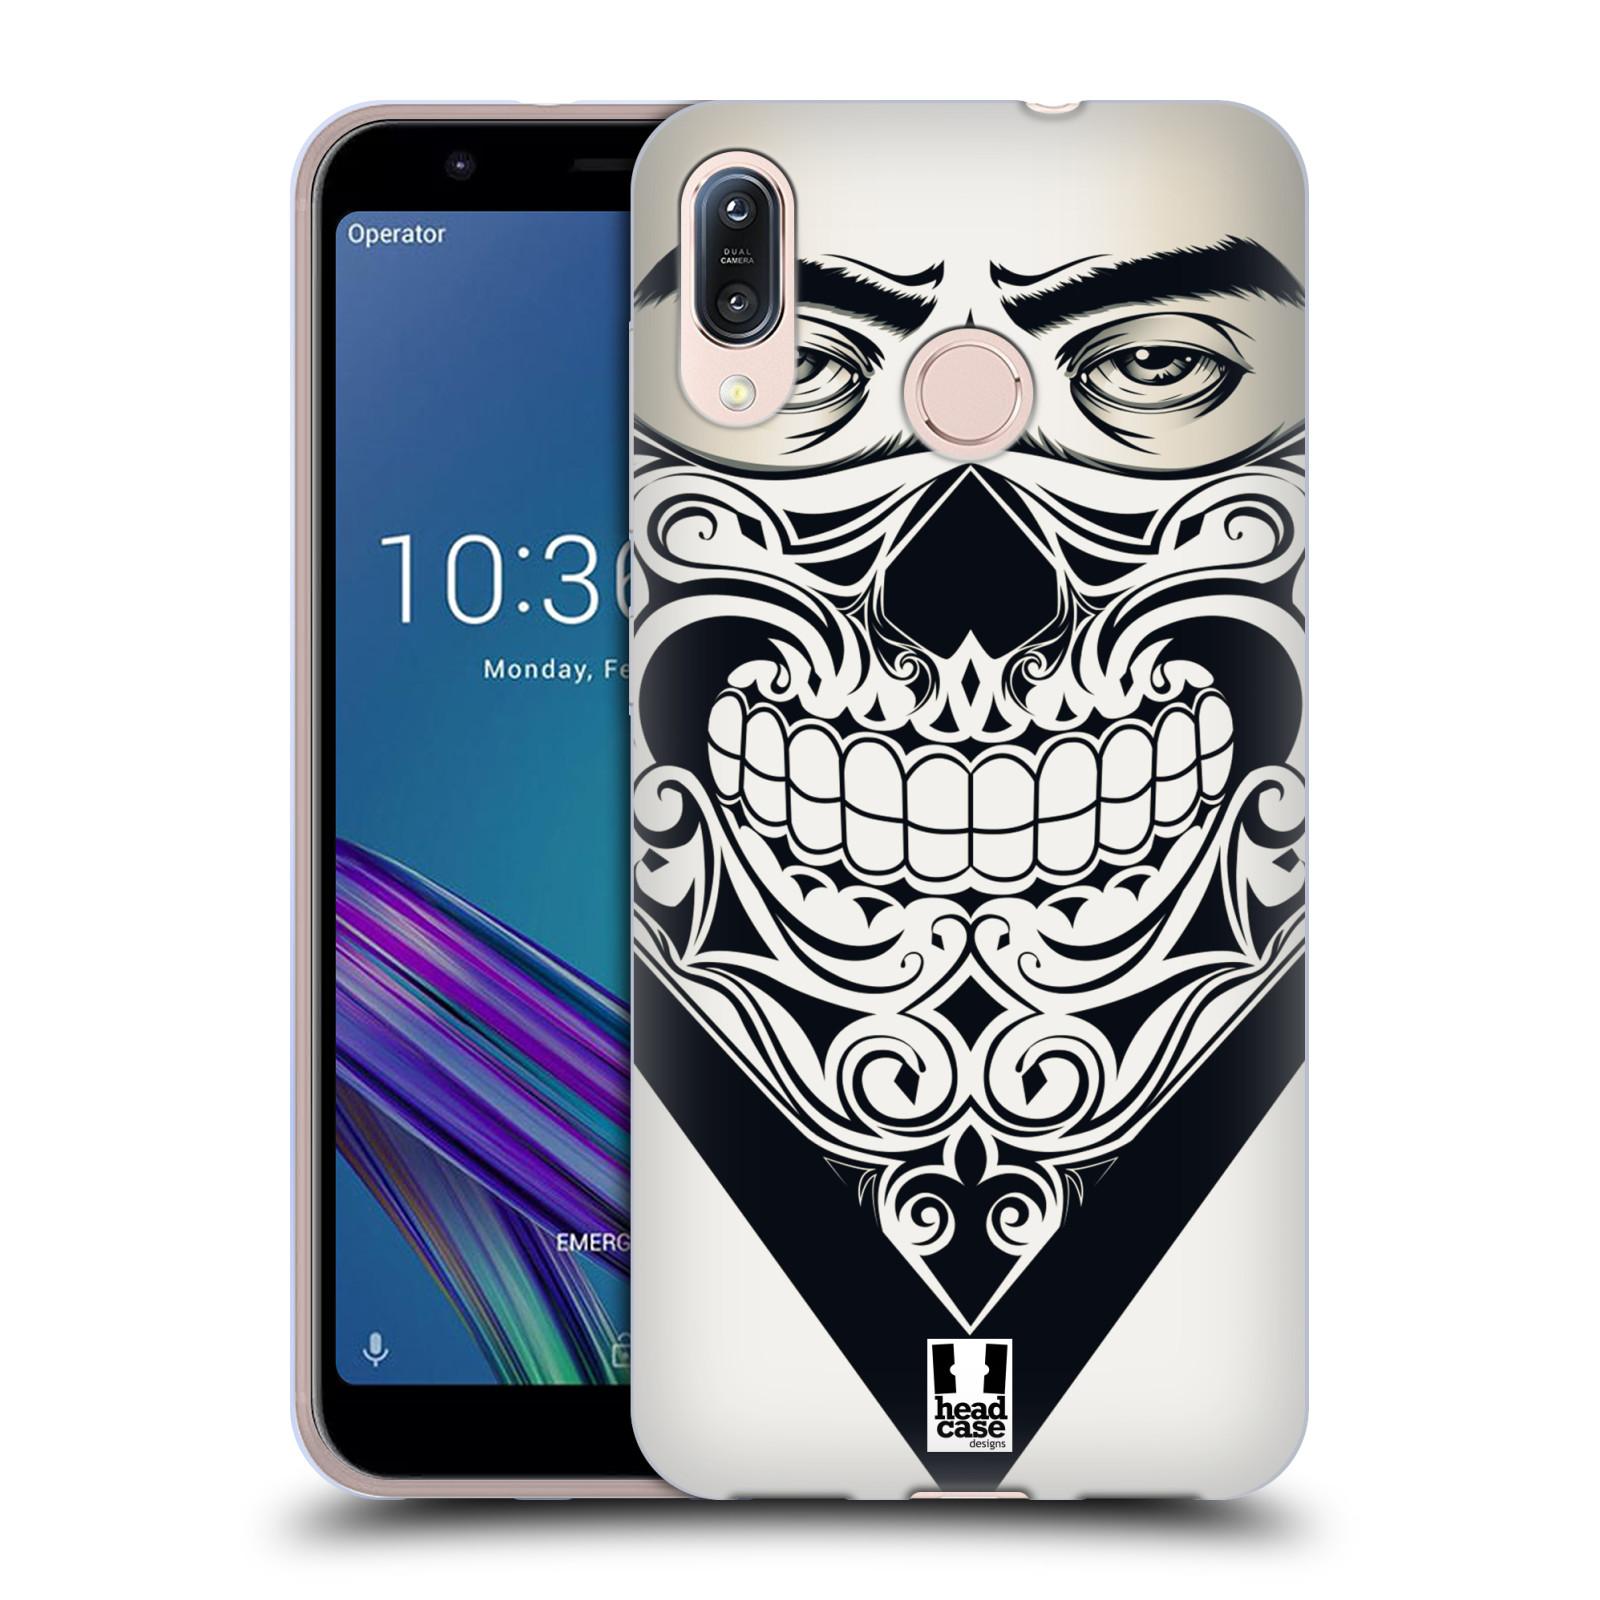 Silikonové pouzdro na mobil Asus Zenfone Max M1 ZB555KL - Head Case - LEBKA BANDANA